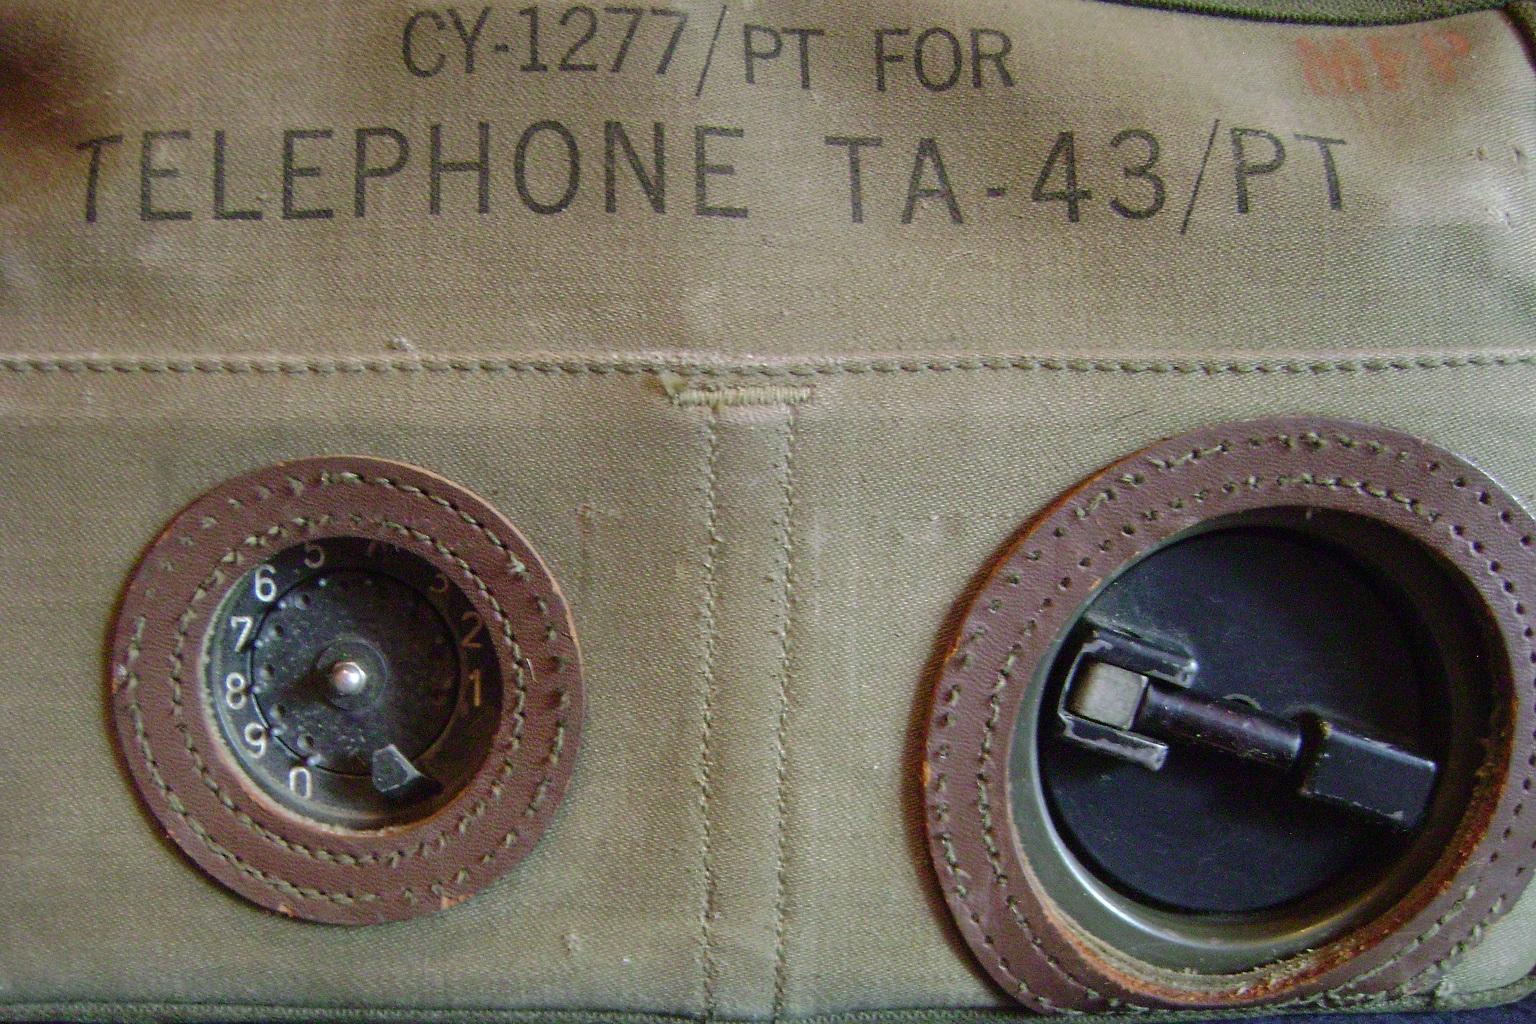 Poljski_telefon_USA_TA-43PT_1950_2.JPG